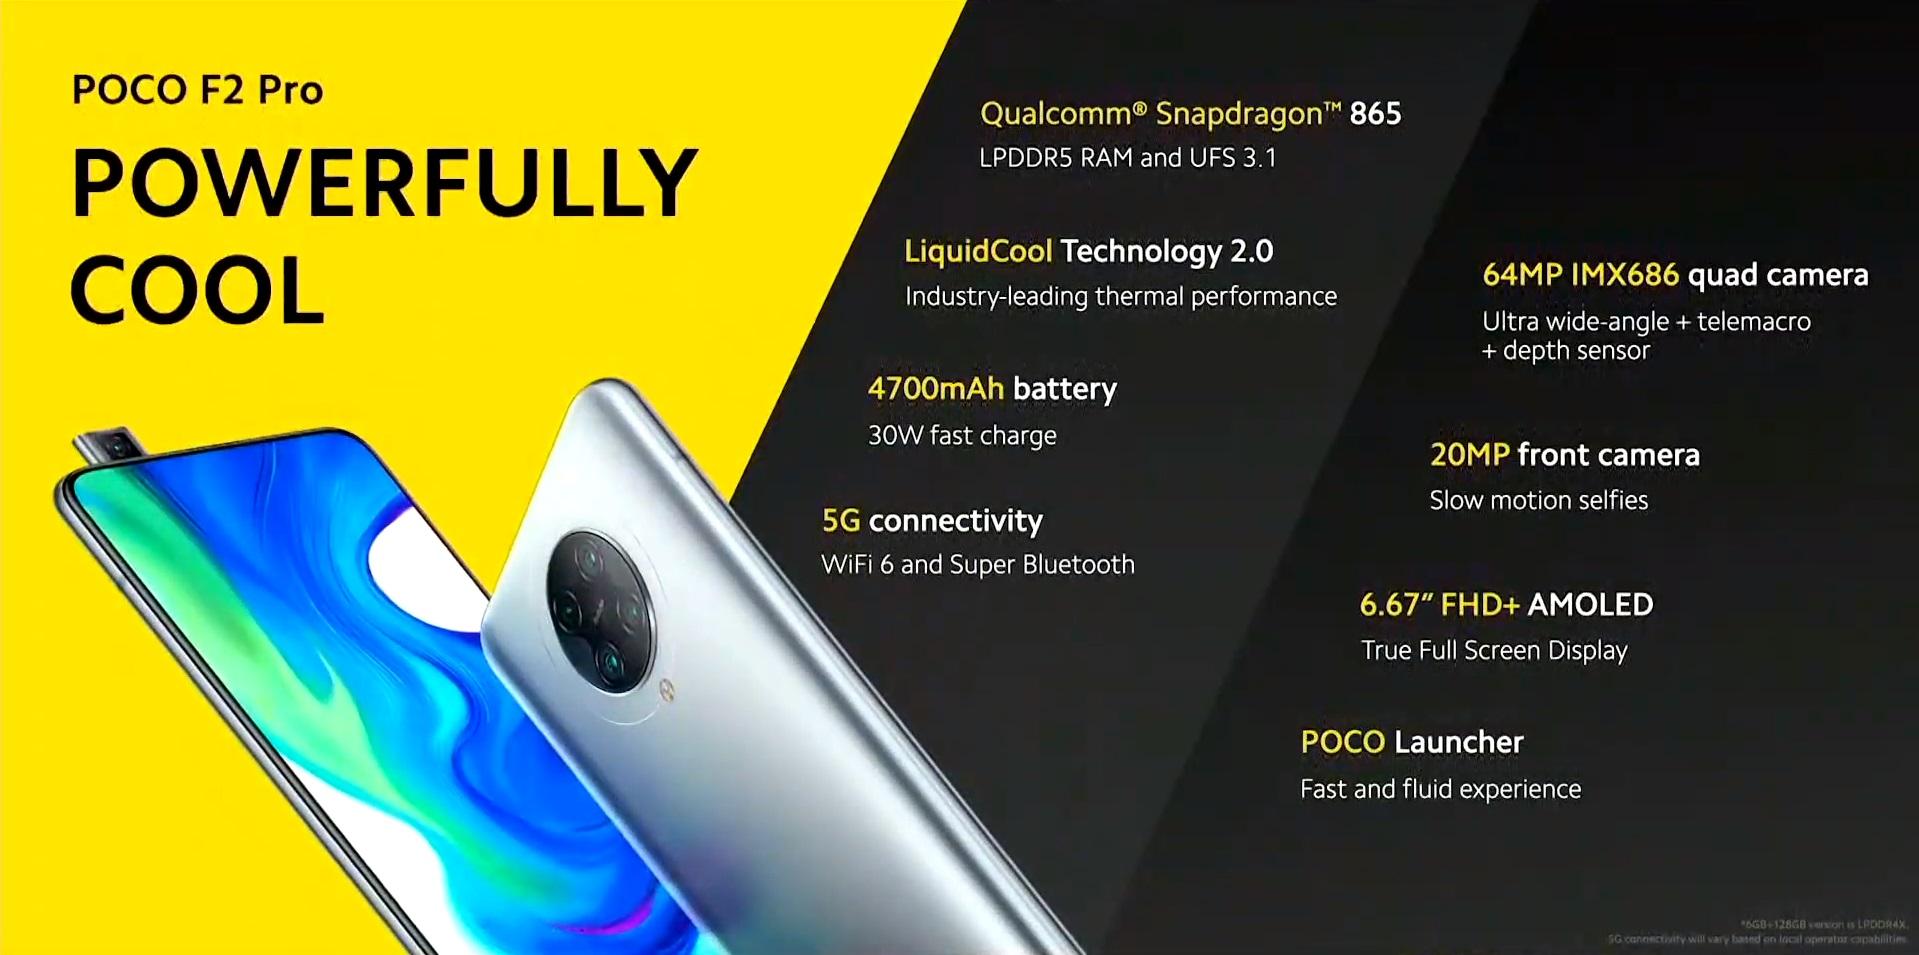 POCO F2 Pro smartphone